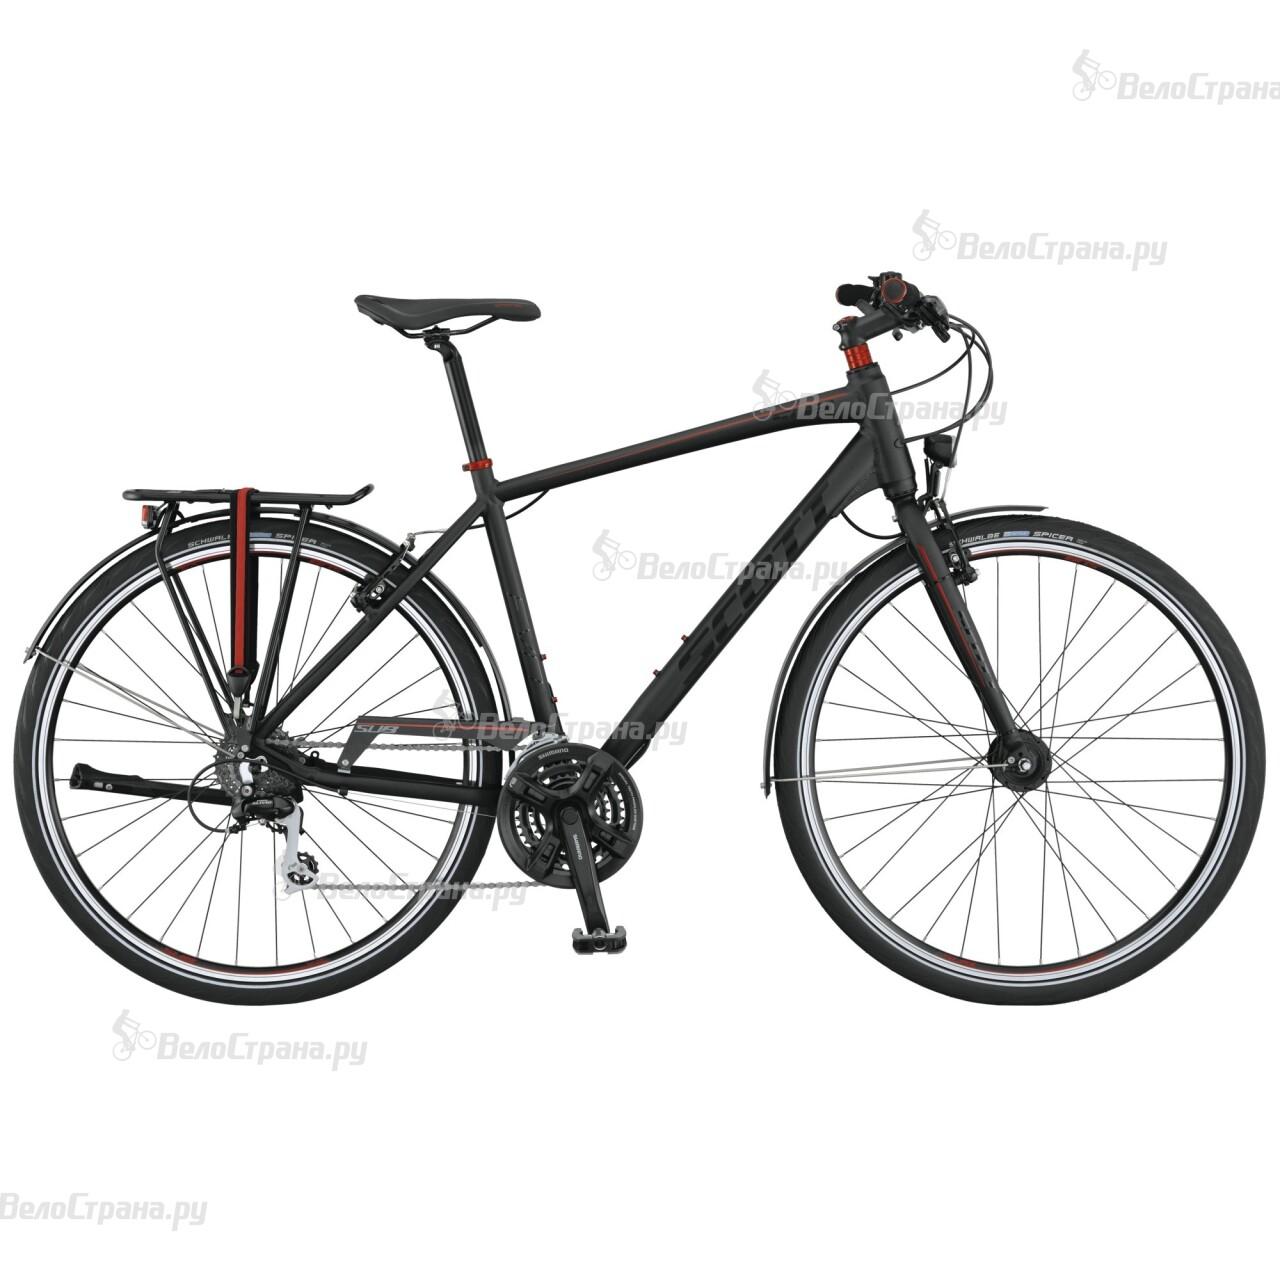 Велосипед Scott Sub Evo 40 (2015)